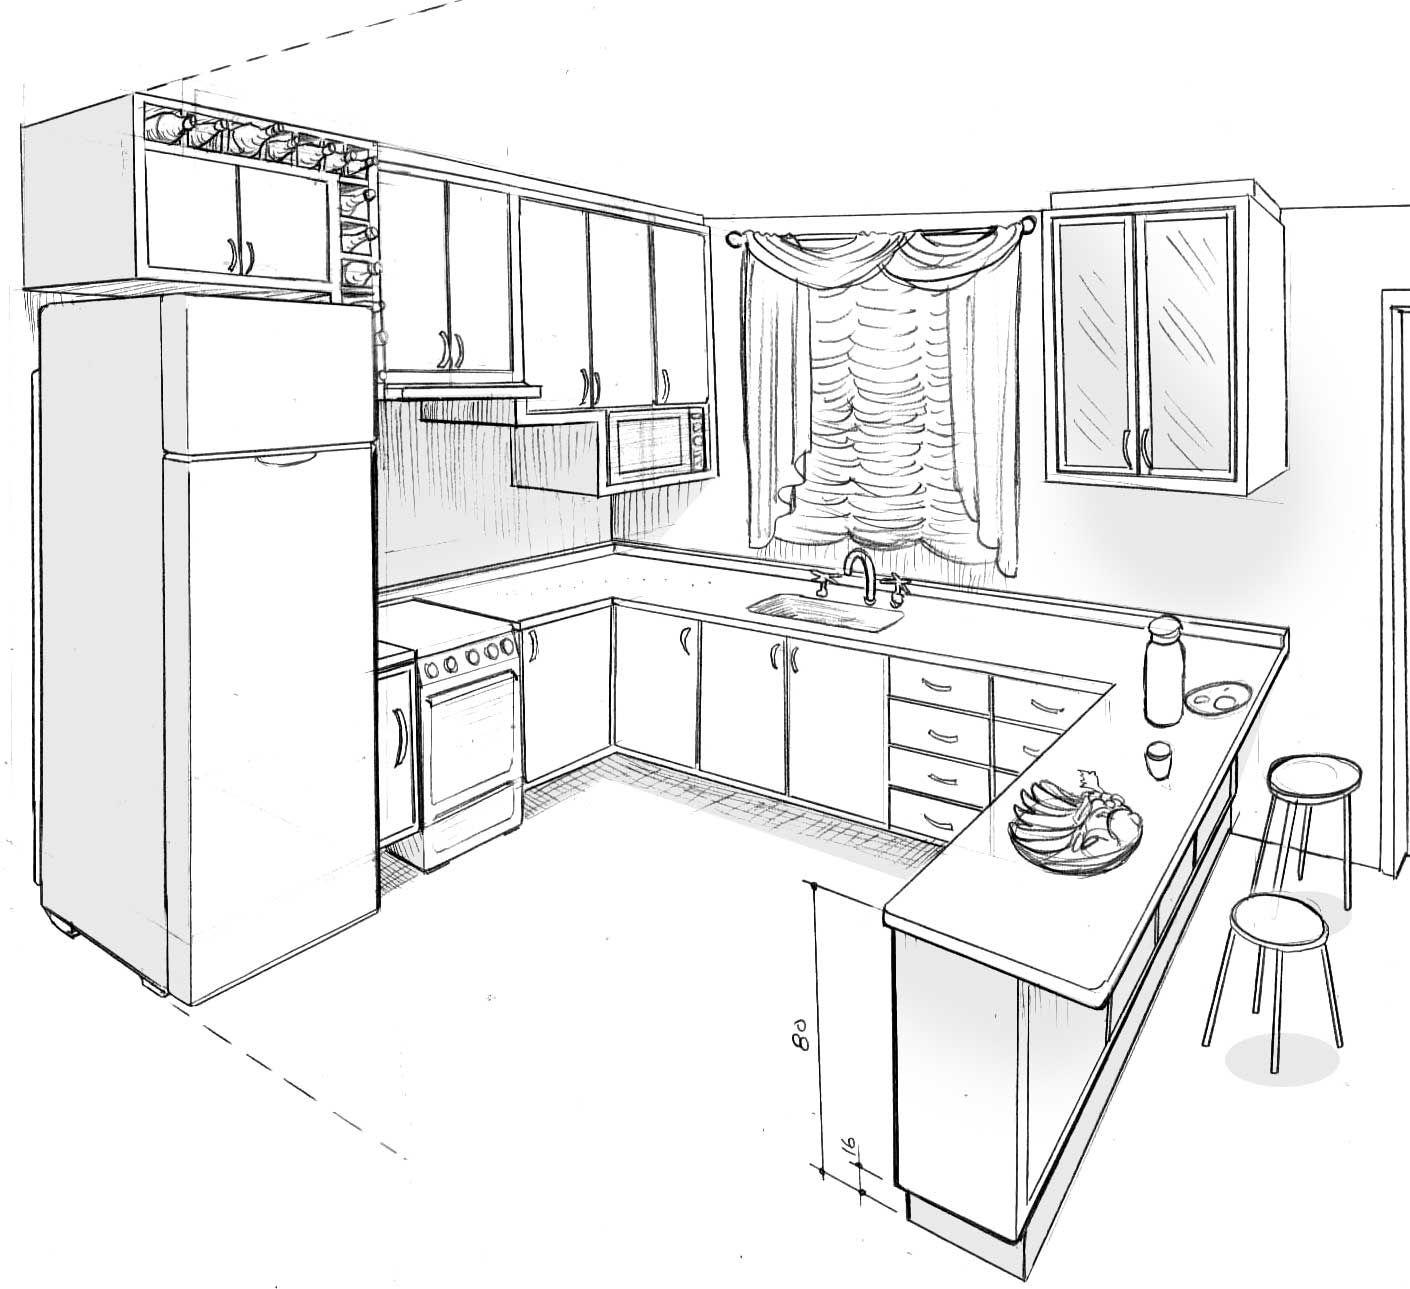 Kitchen Layout Sketch: DESENHOS DE AMBIENTES EM PERSPECTIVA